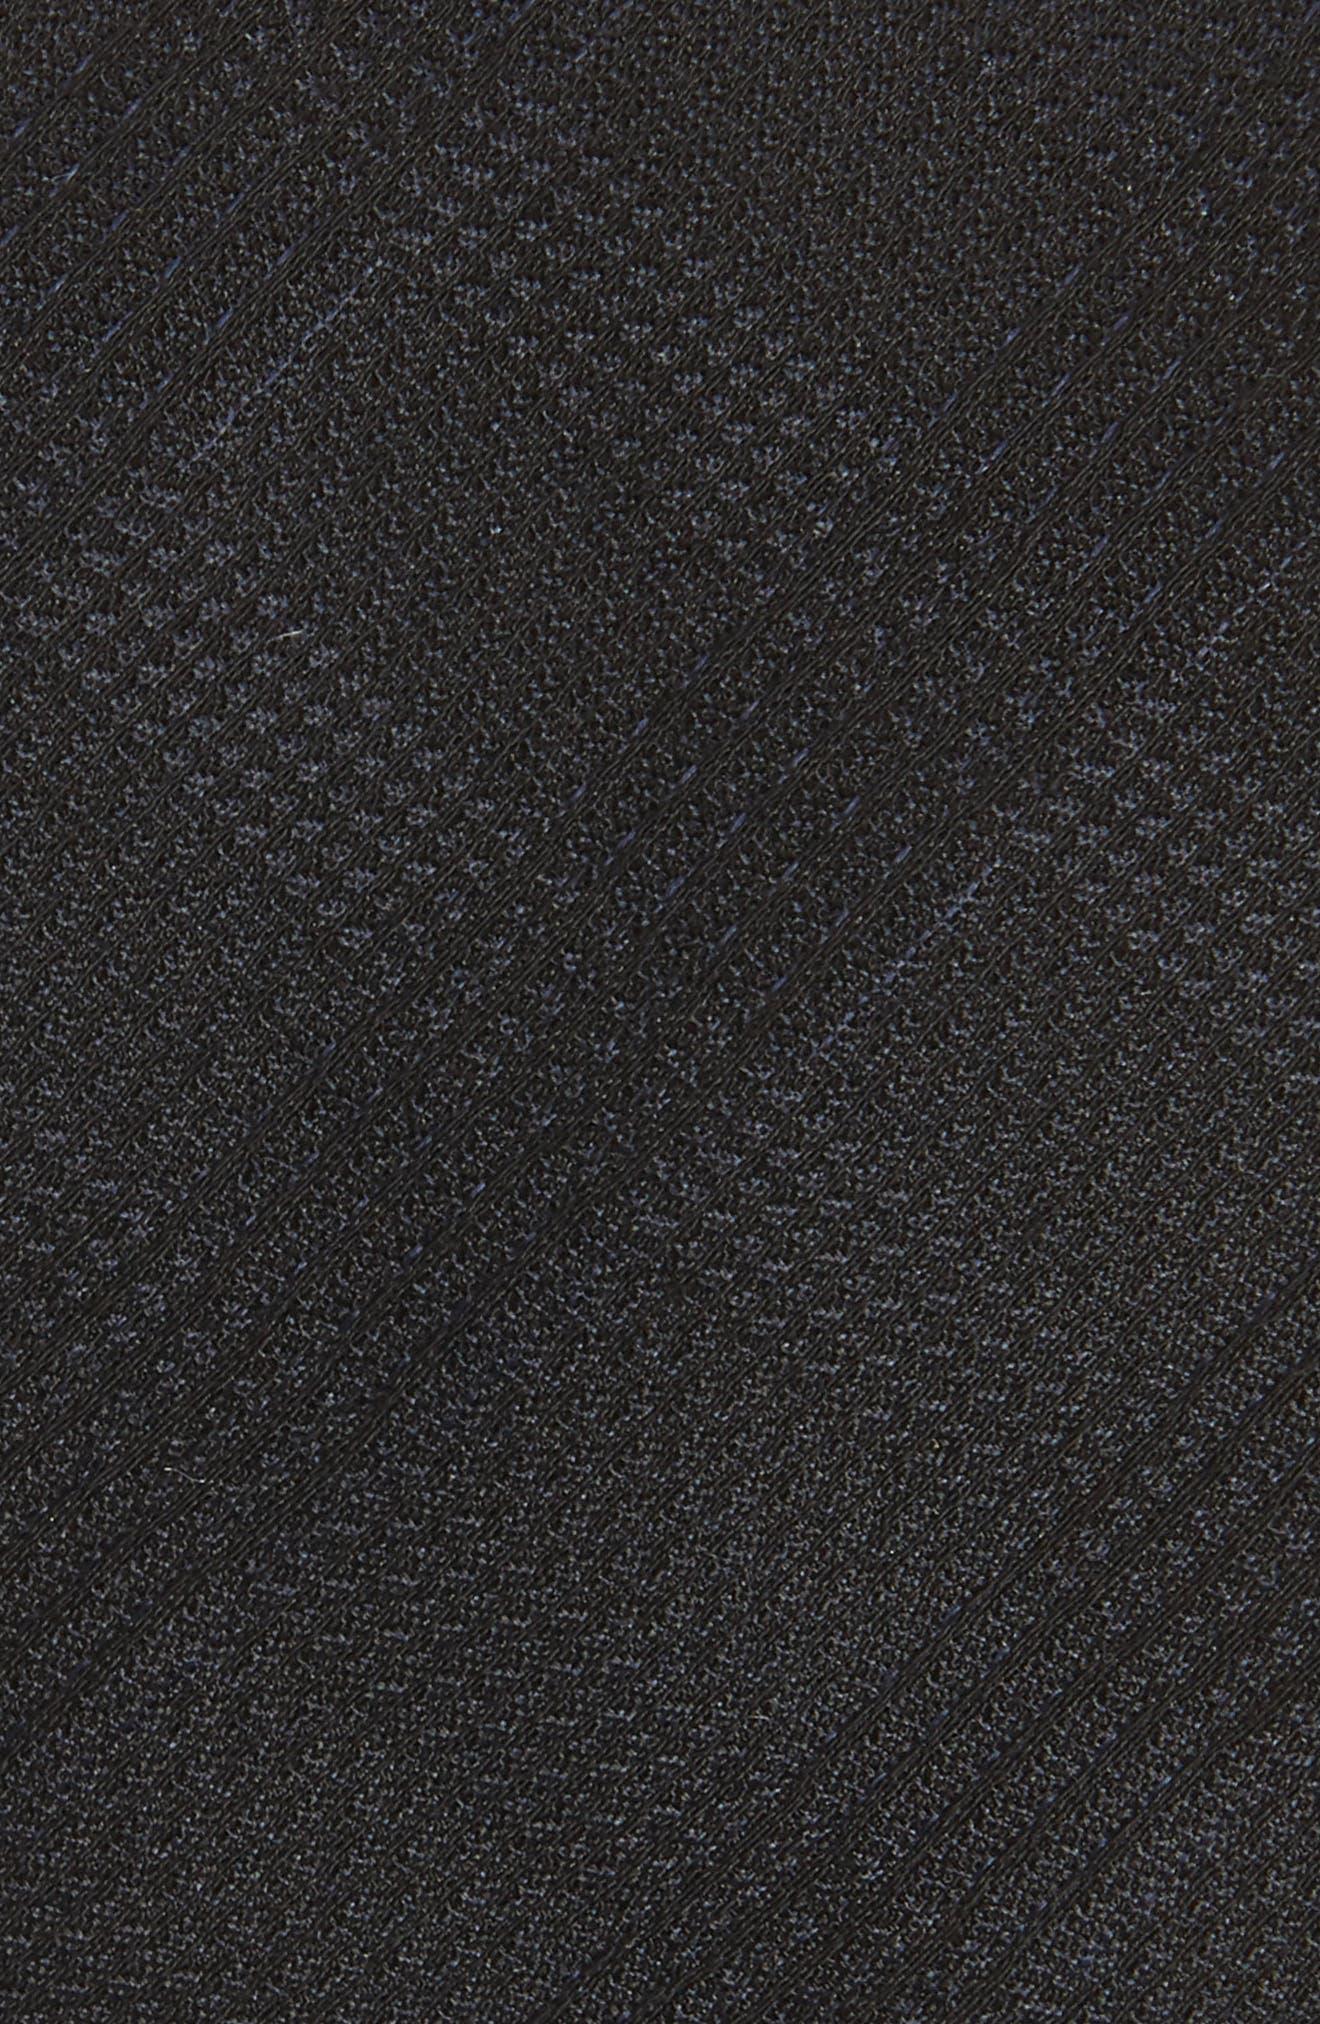 Check Weave Tie,                             Alternate thumbnail 2, color,                             001